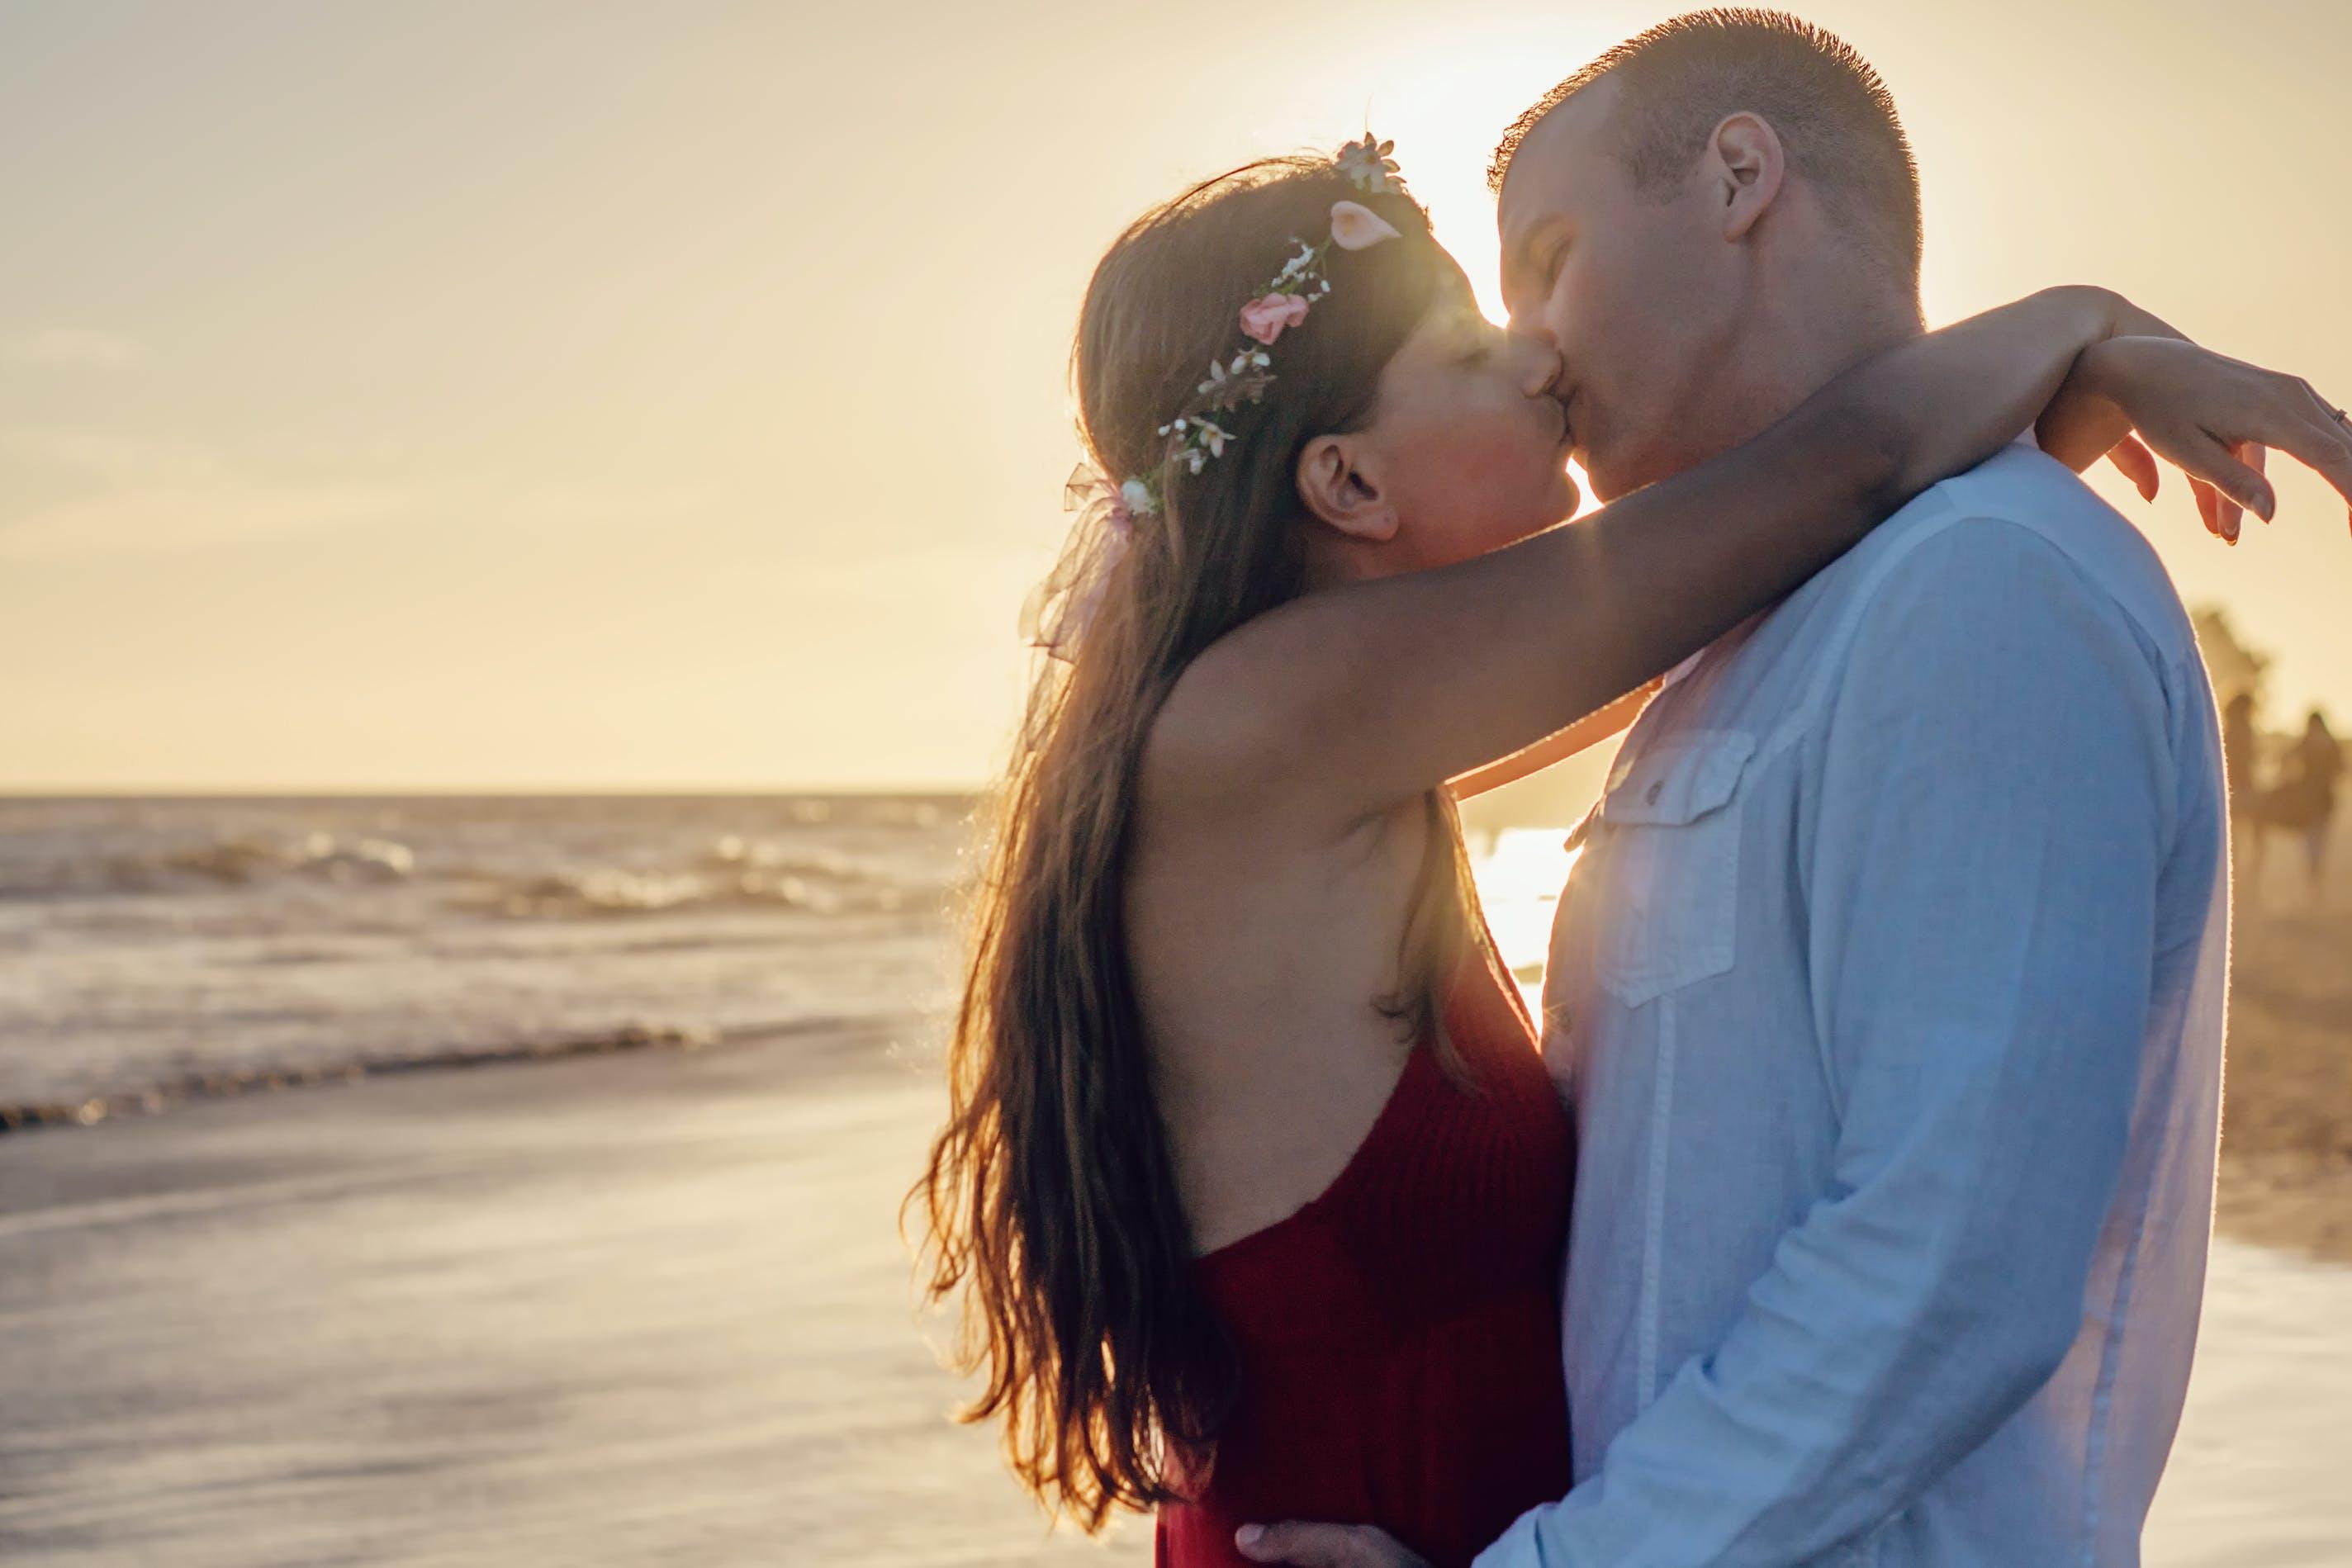 affection, backlit, beach